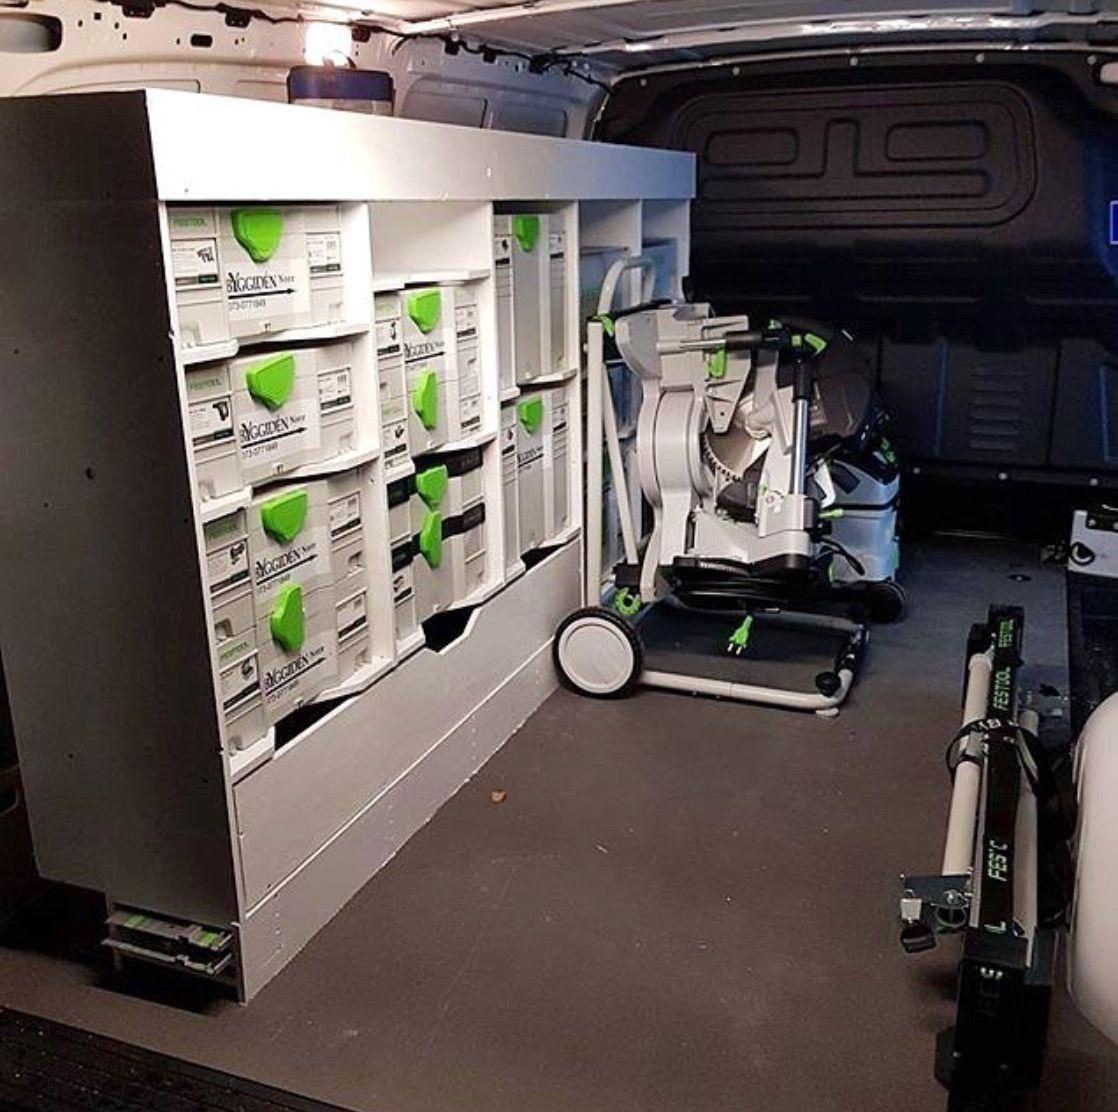 Pin by björn liljeblad on garage pinterest organizations and storage